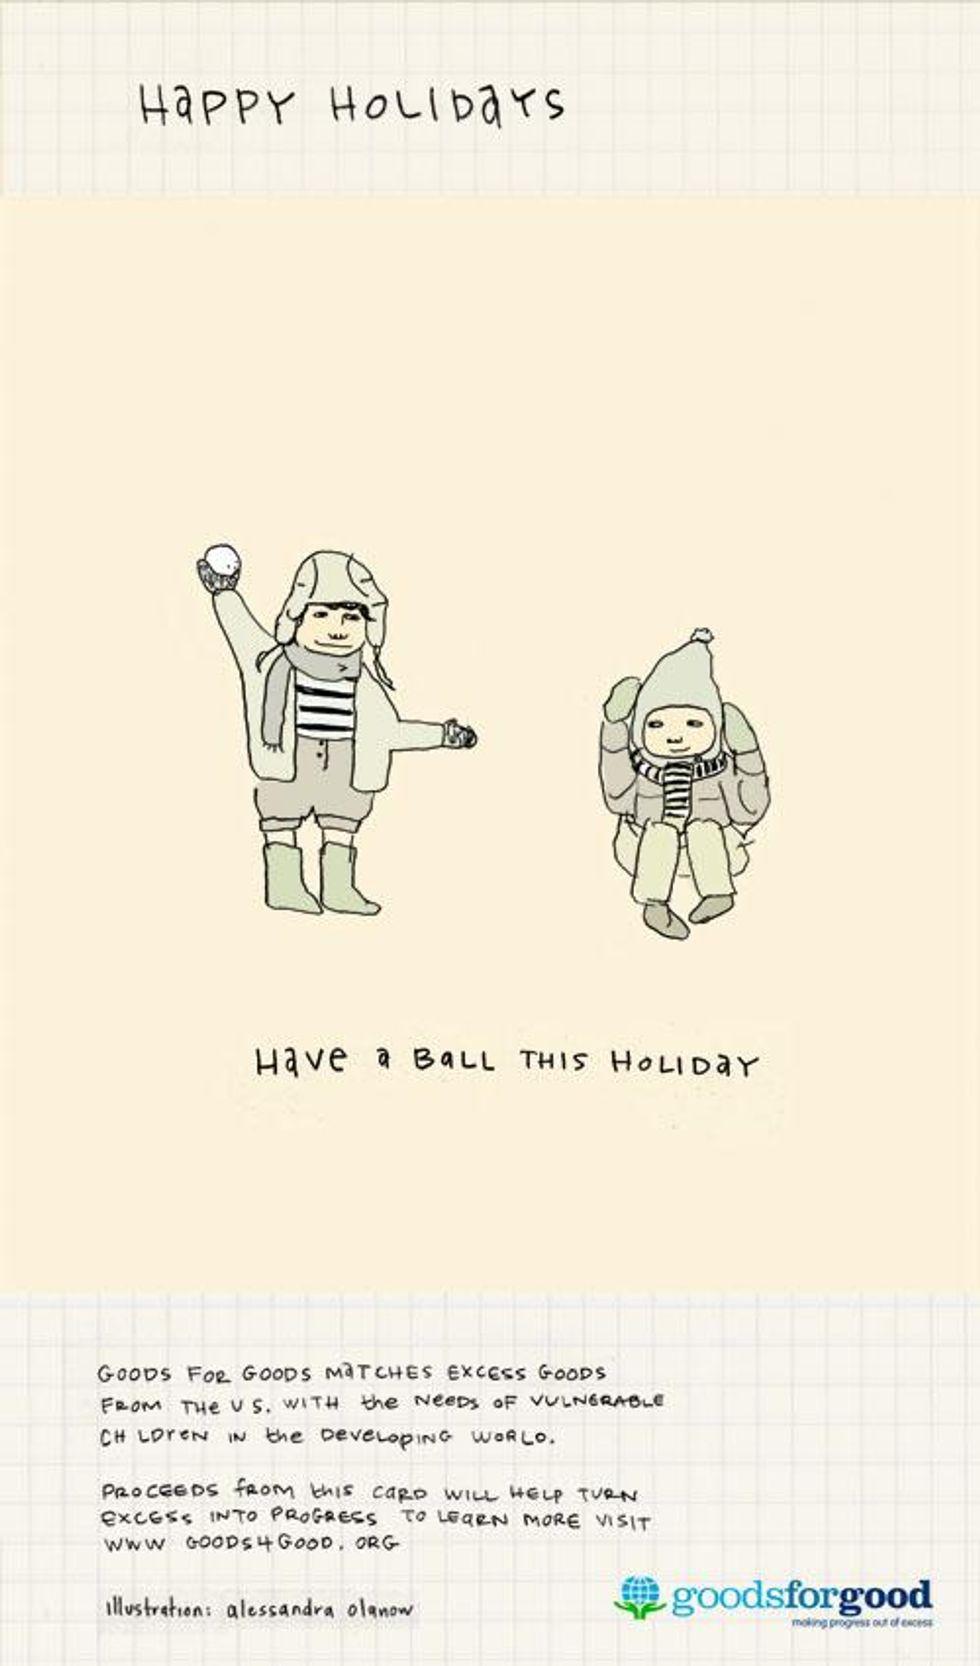 Gentleman of Leisure: Goods 4 Good 4 the Holidays.